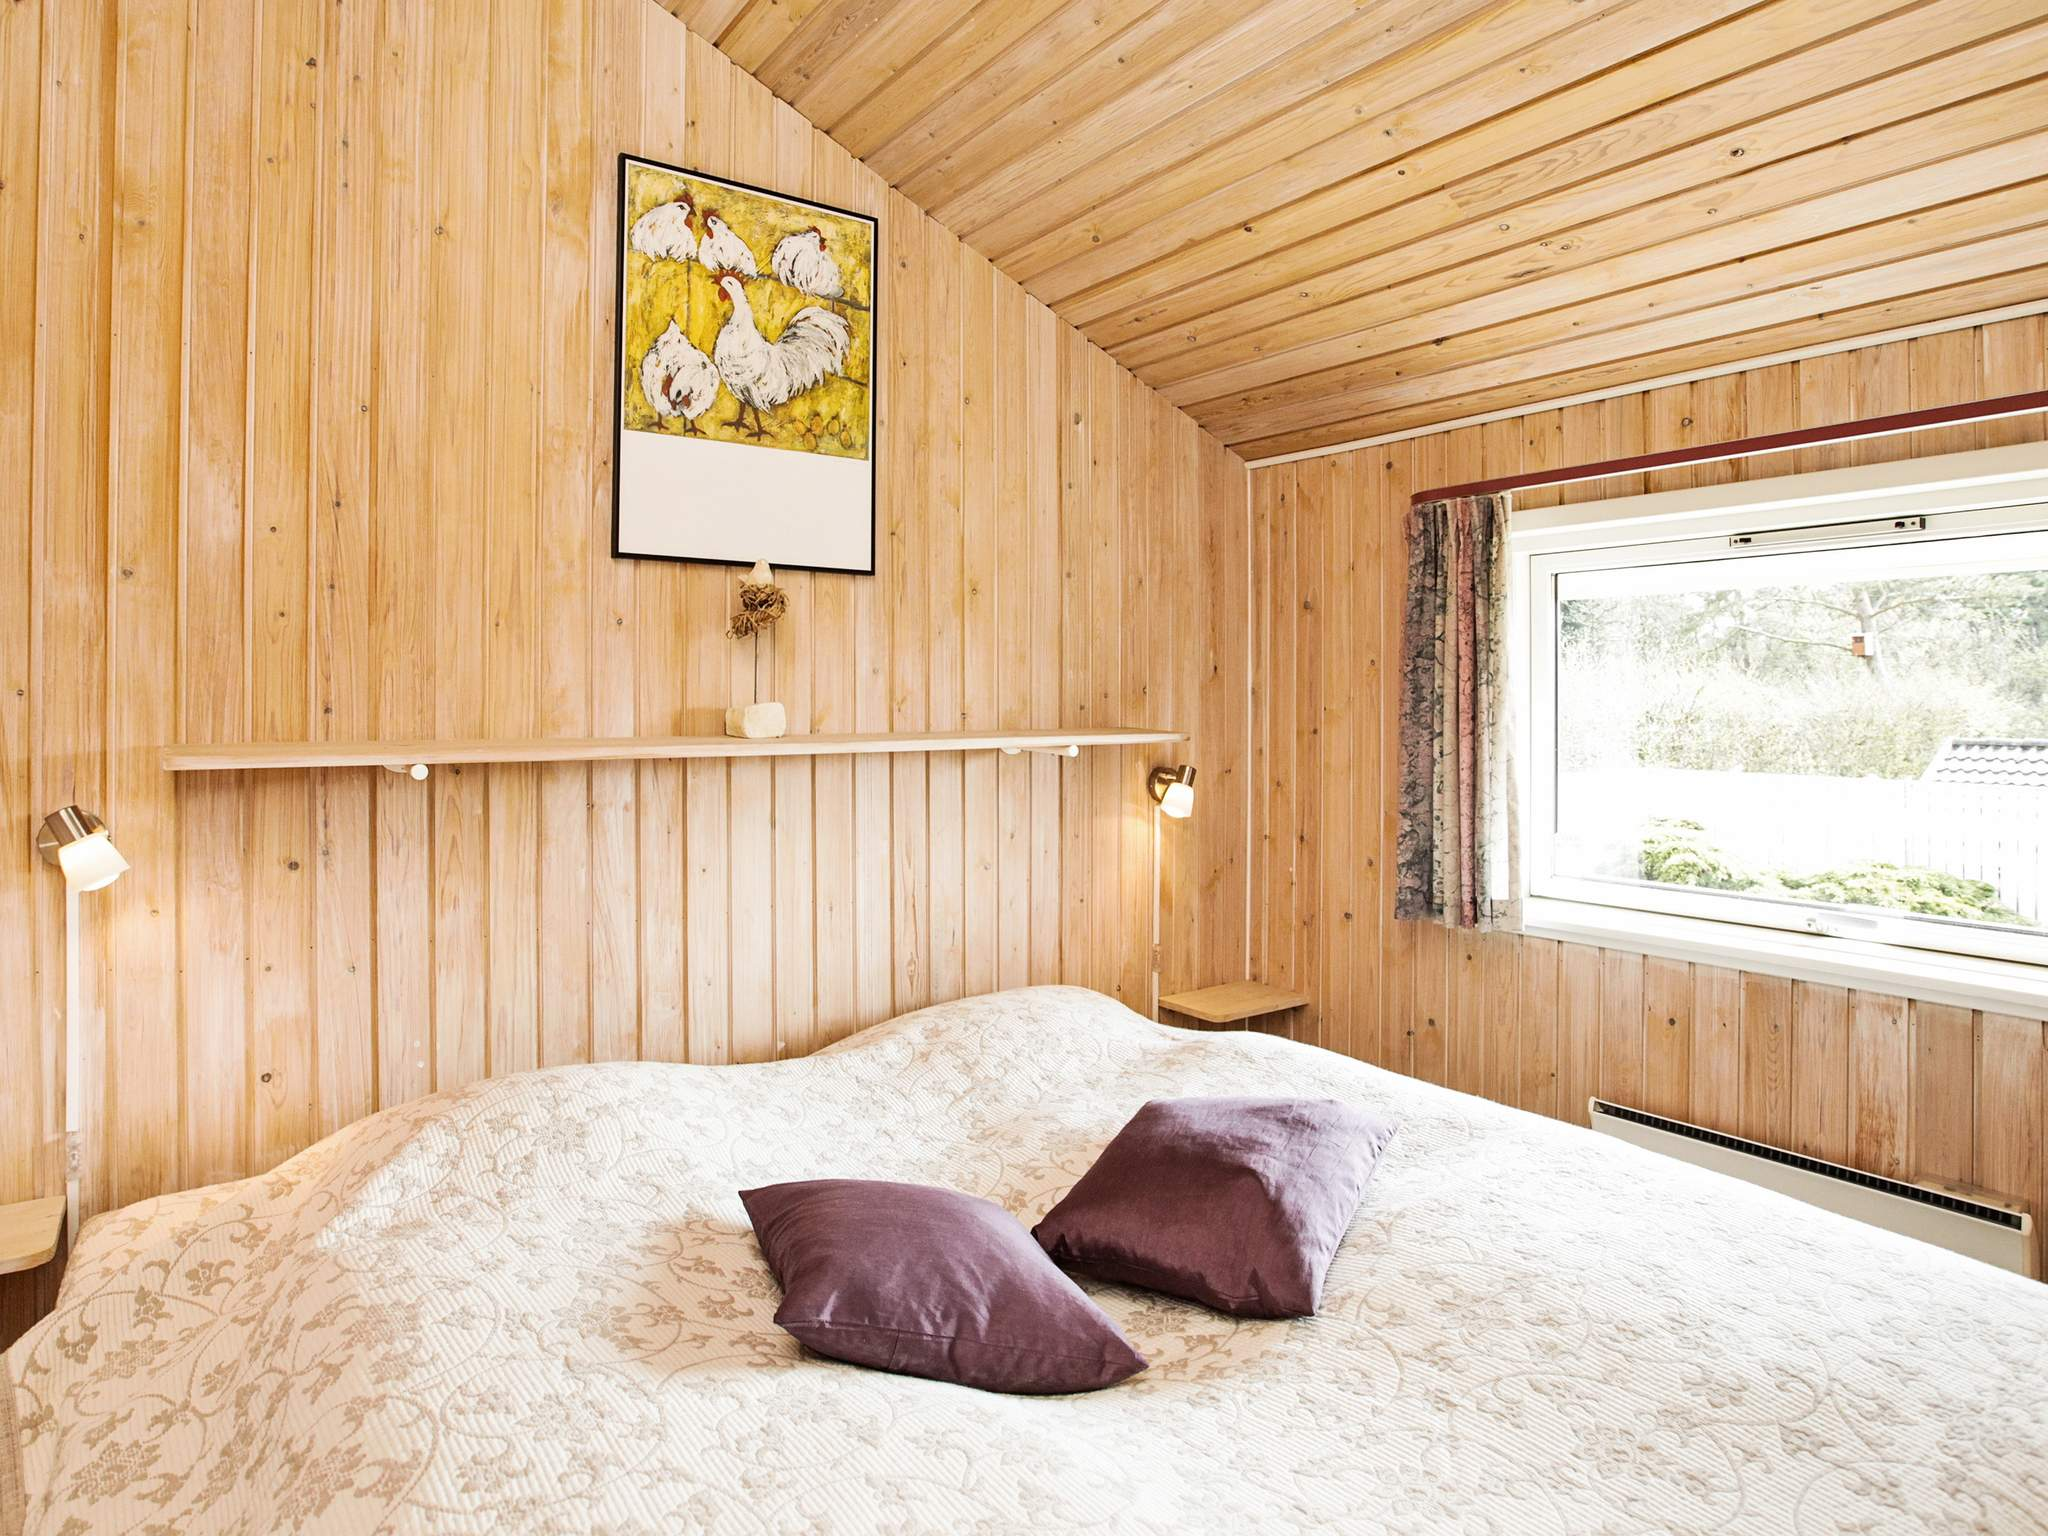 Maison de vacances Falsled (87545), Faldsled, , Fionie, Danemark, image 12